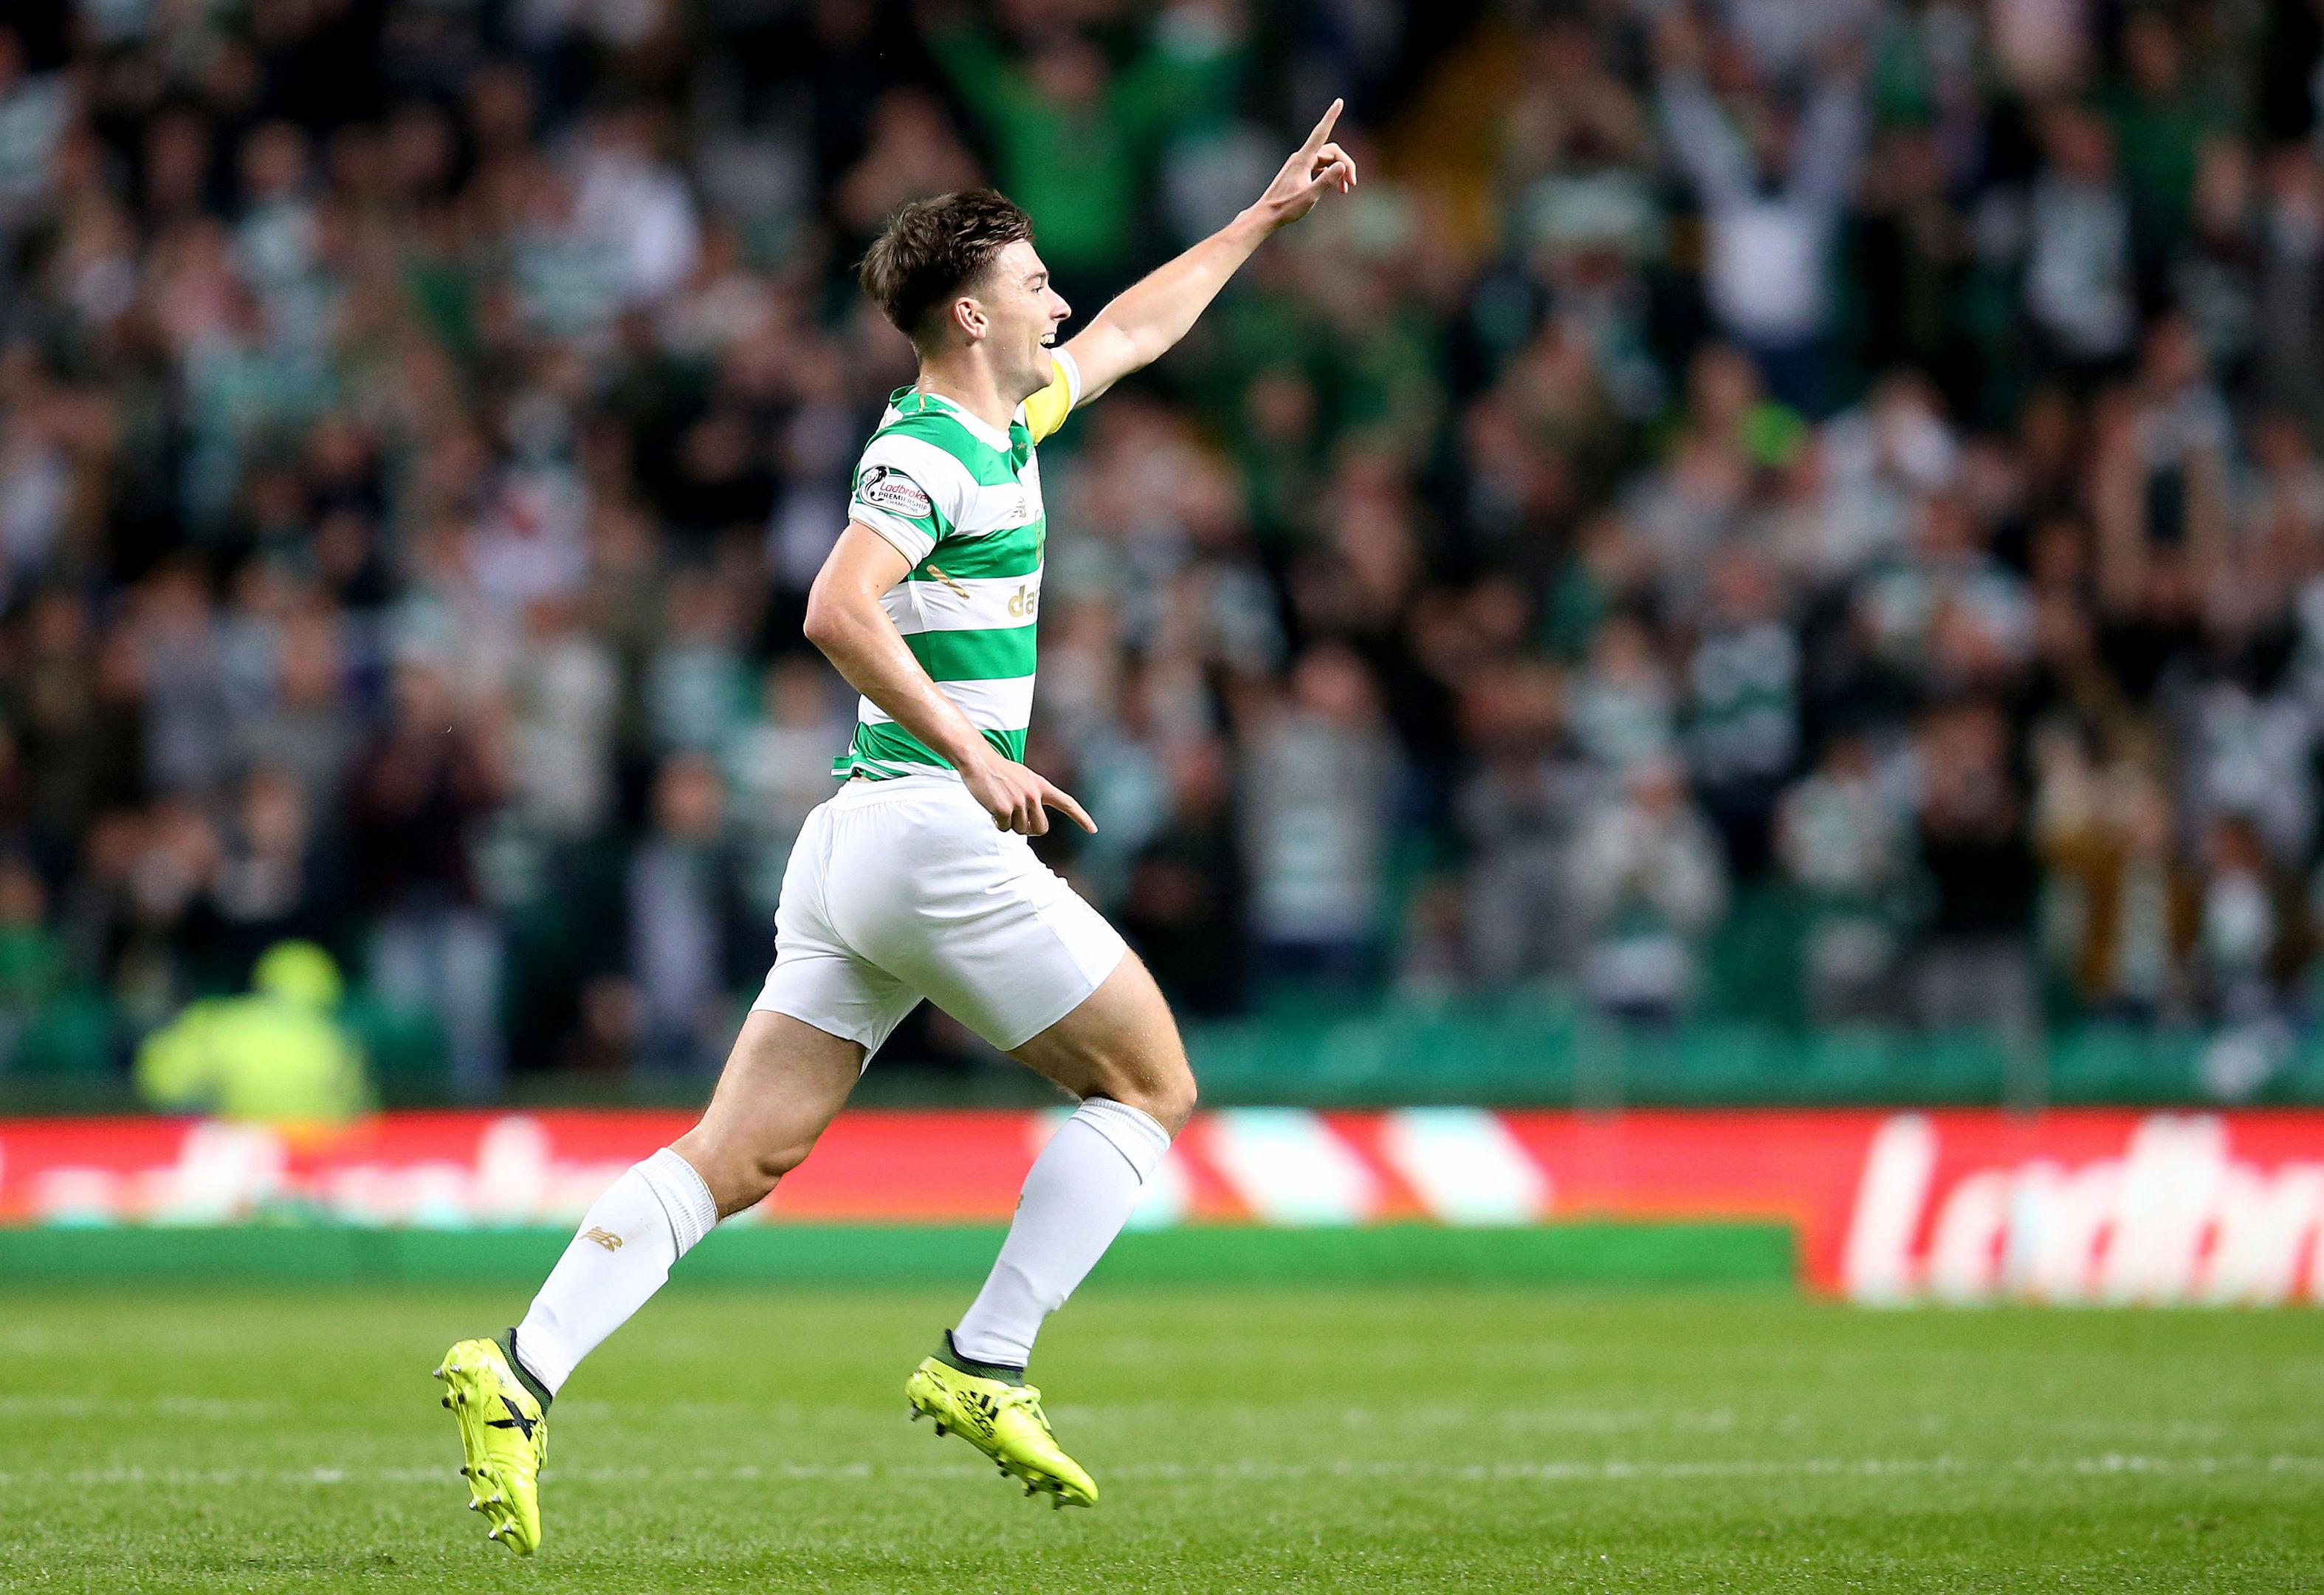 Celtic's Kieran Tierney celebrates scoring (Jane Barlow/PA Wire)